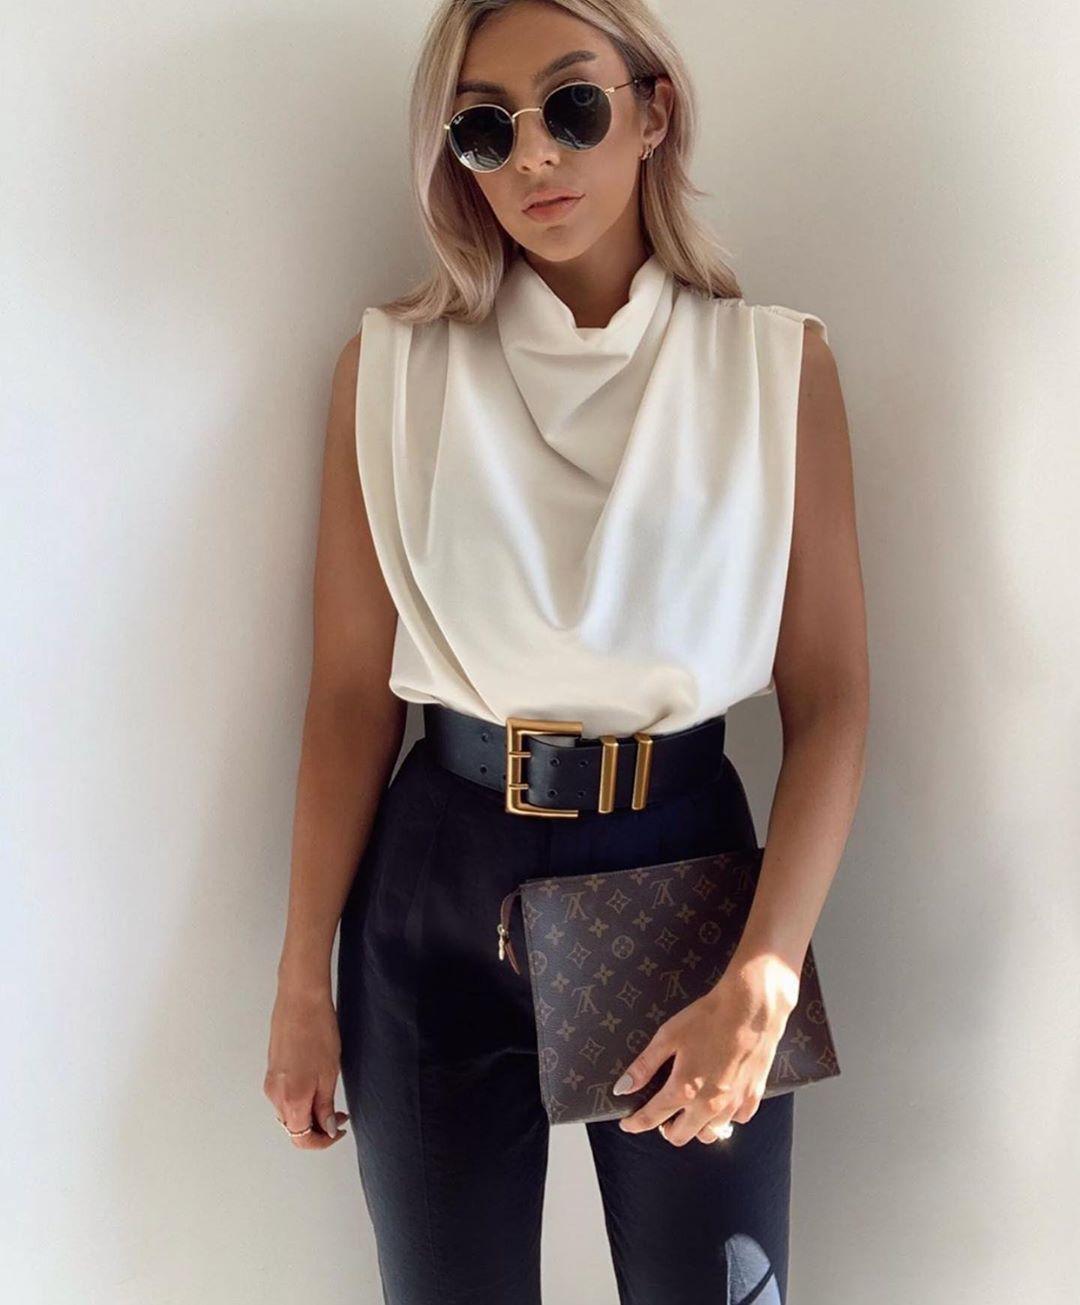 pantalon taille haute avec ceinture de Zara sur zara.outfits